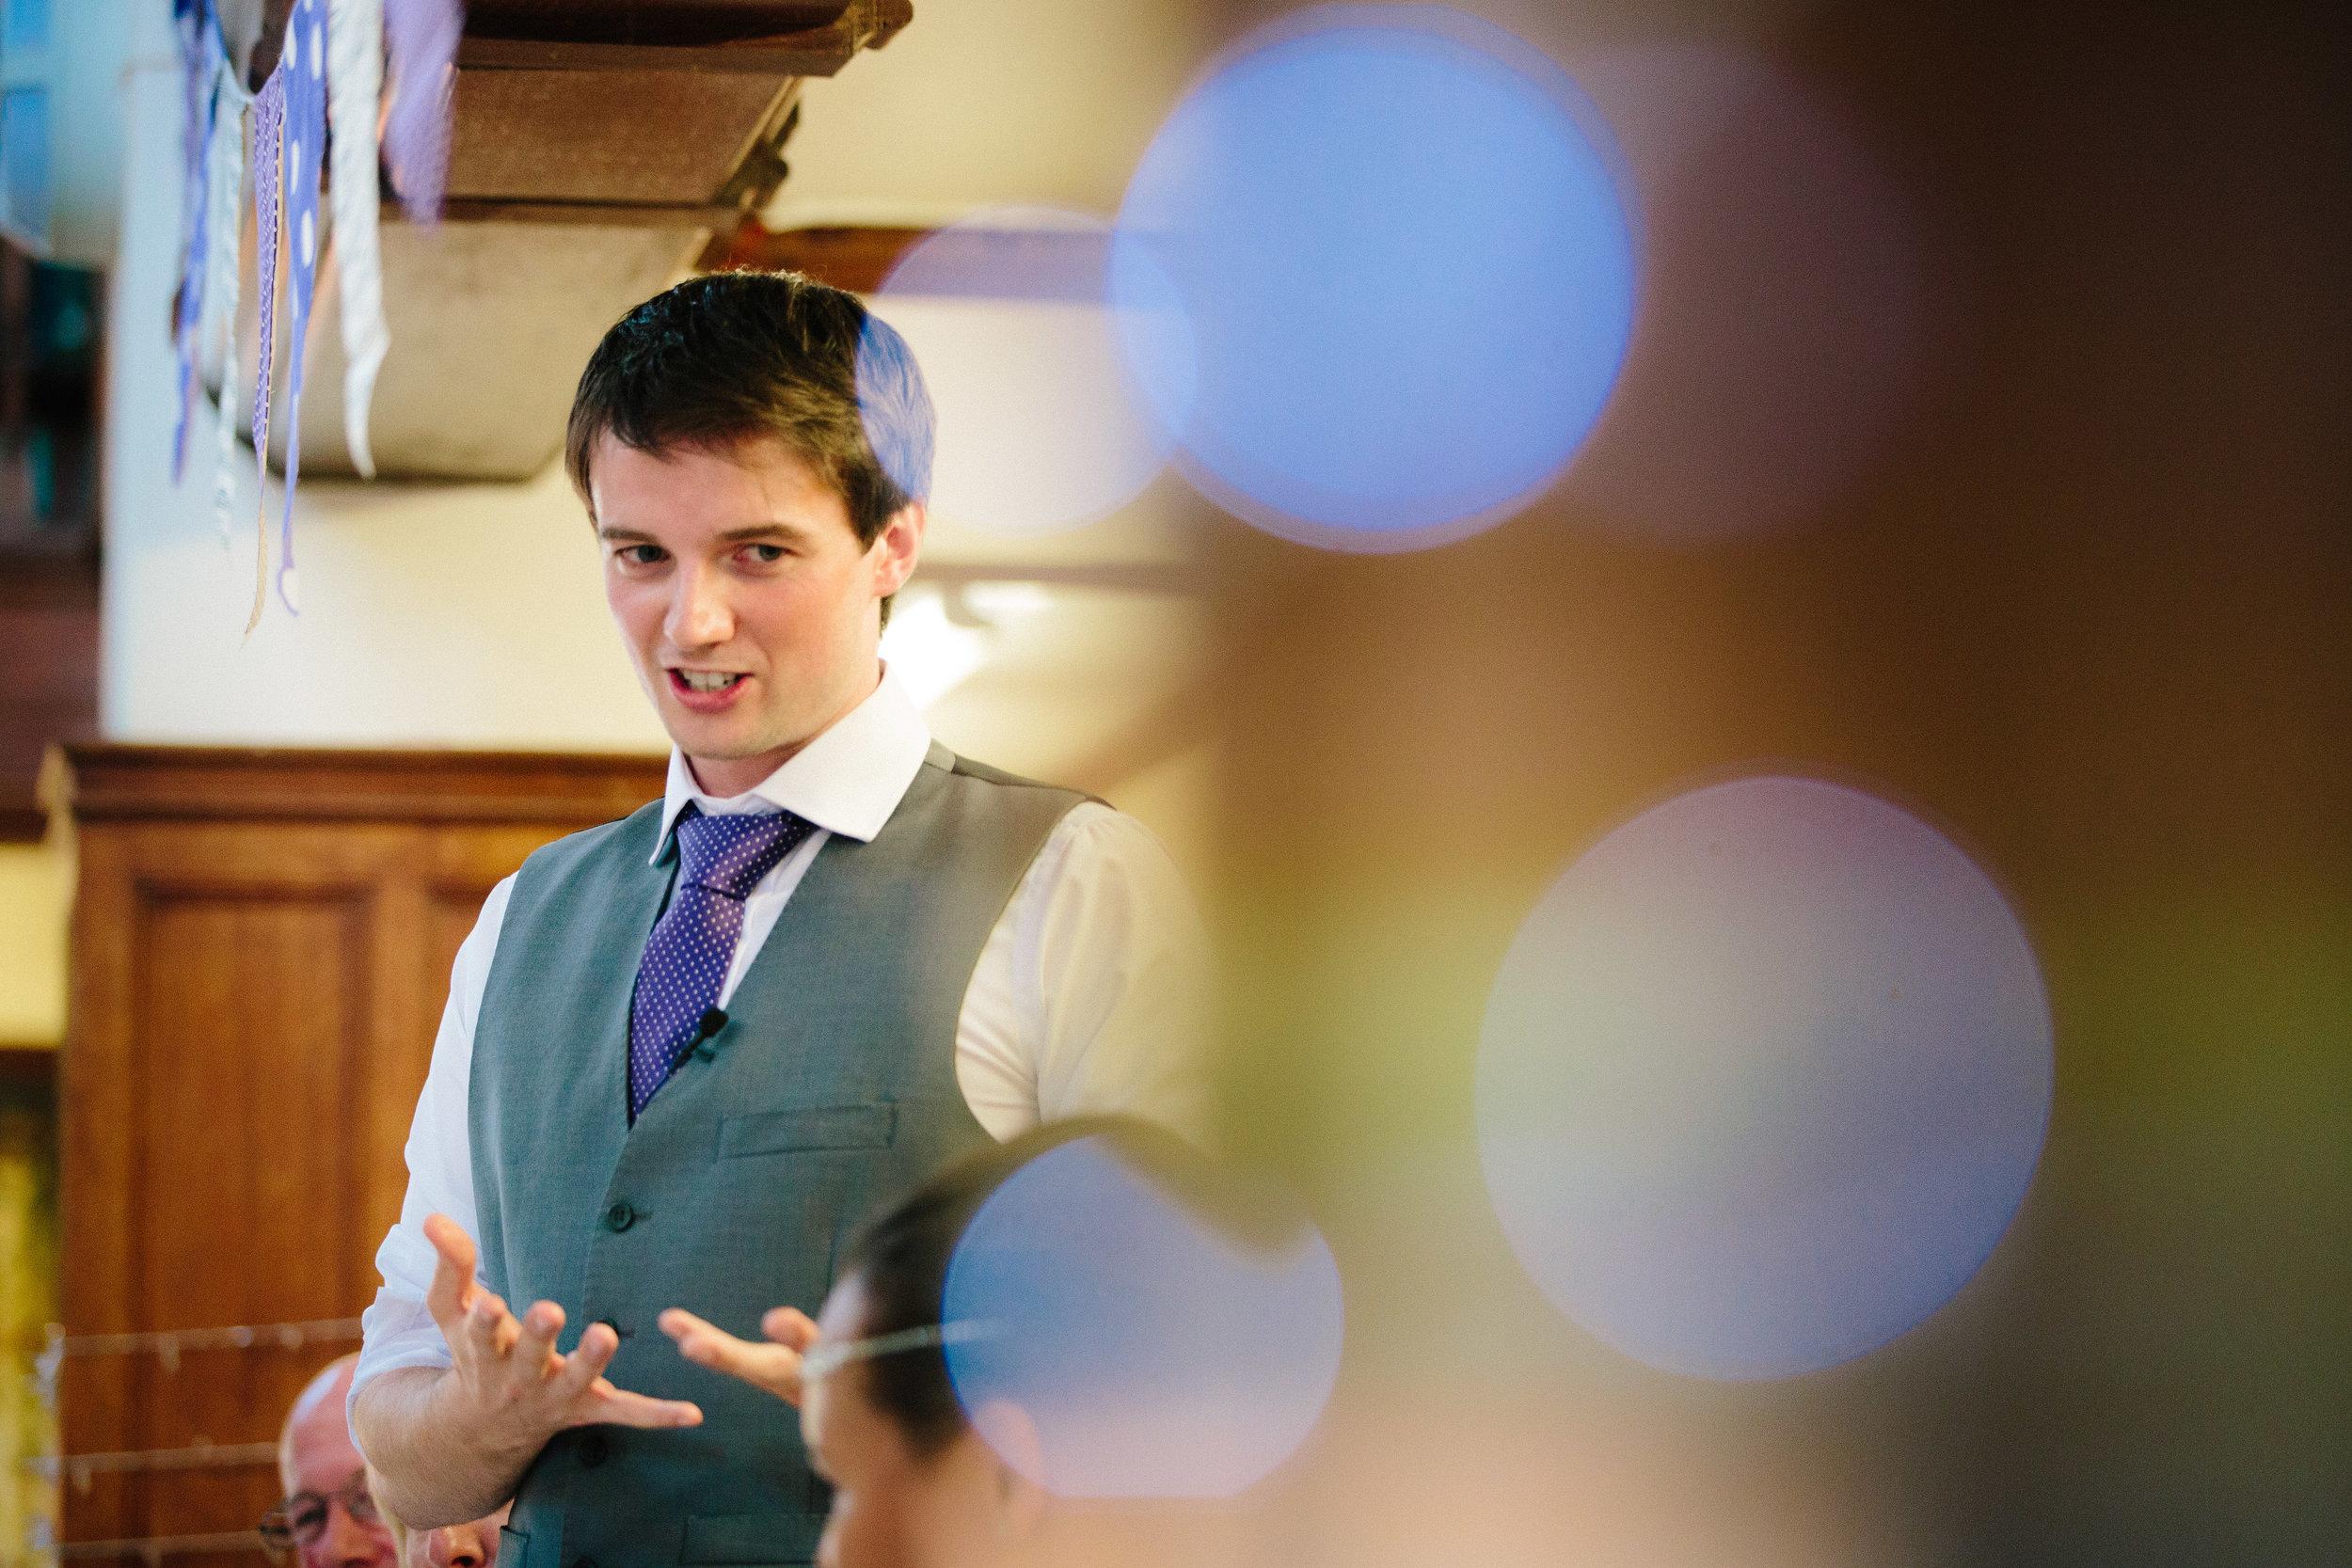 Saint-Alfege-Church-greenwich-wedding-charlton-house-speech-350